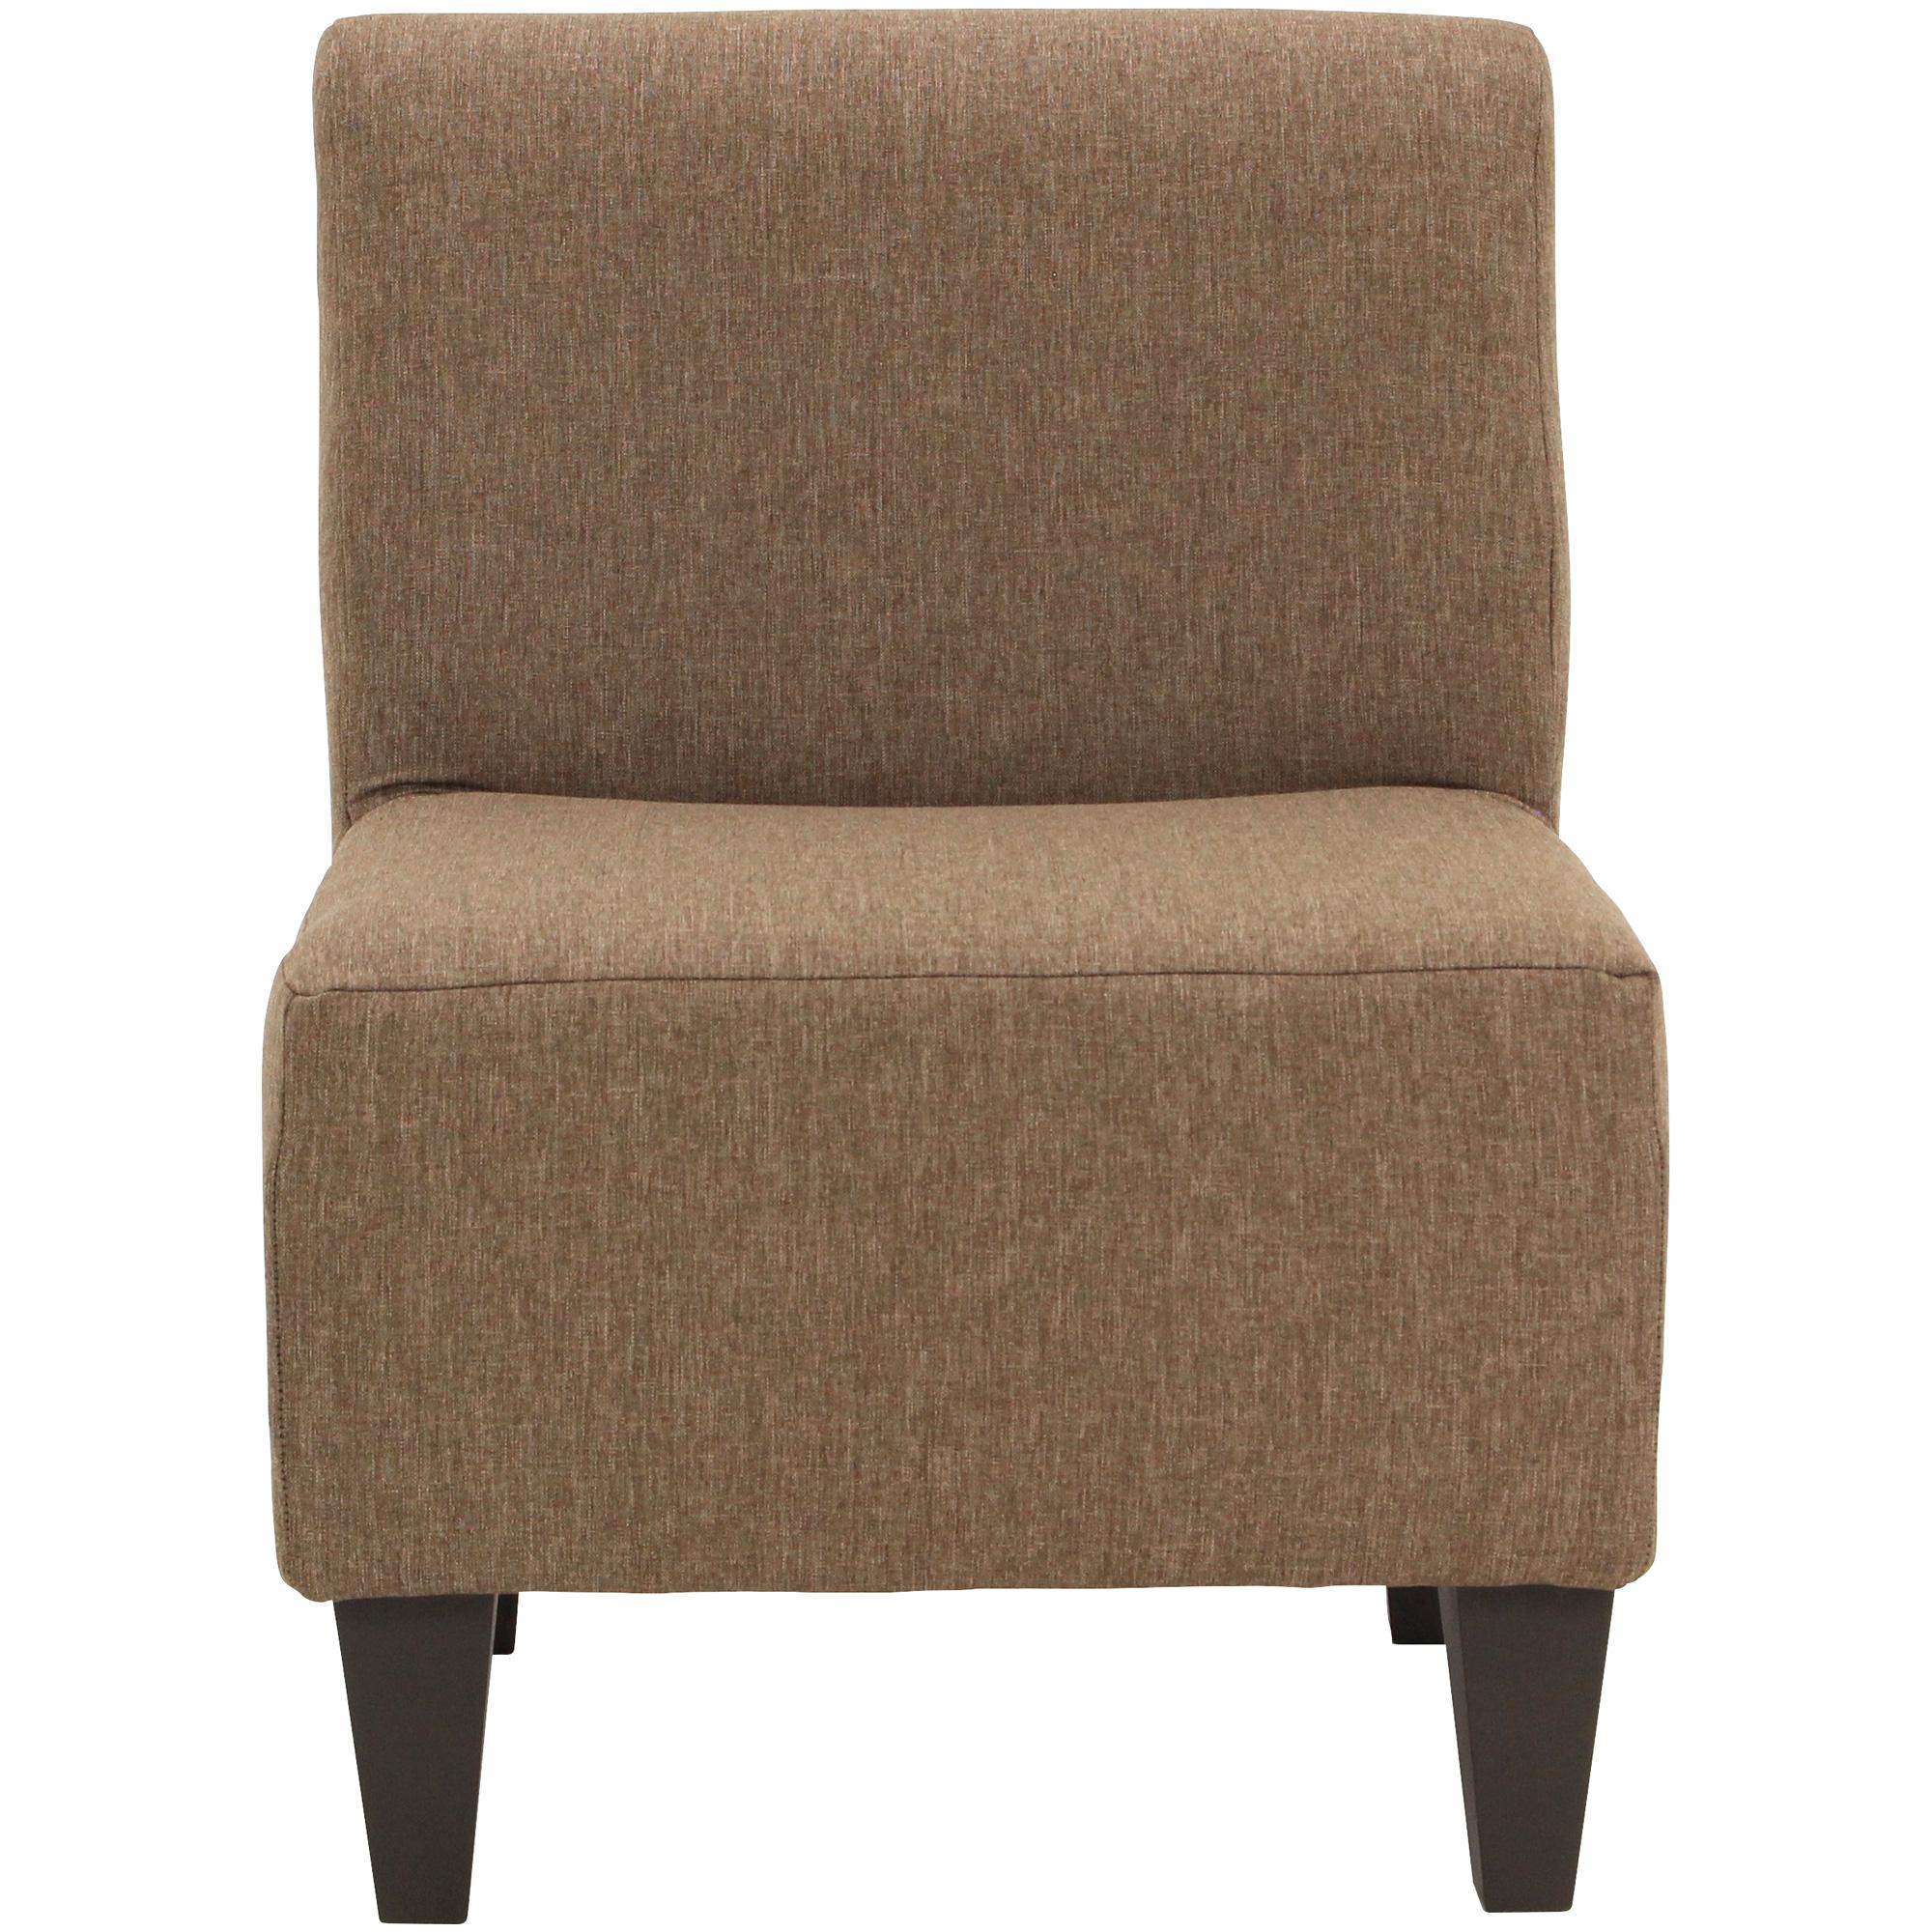 Overman | Amanda Pecan Accent Chair